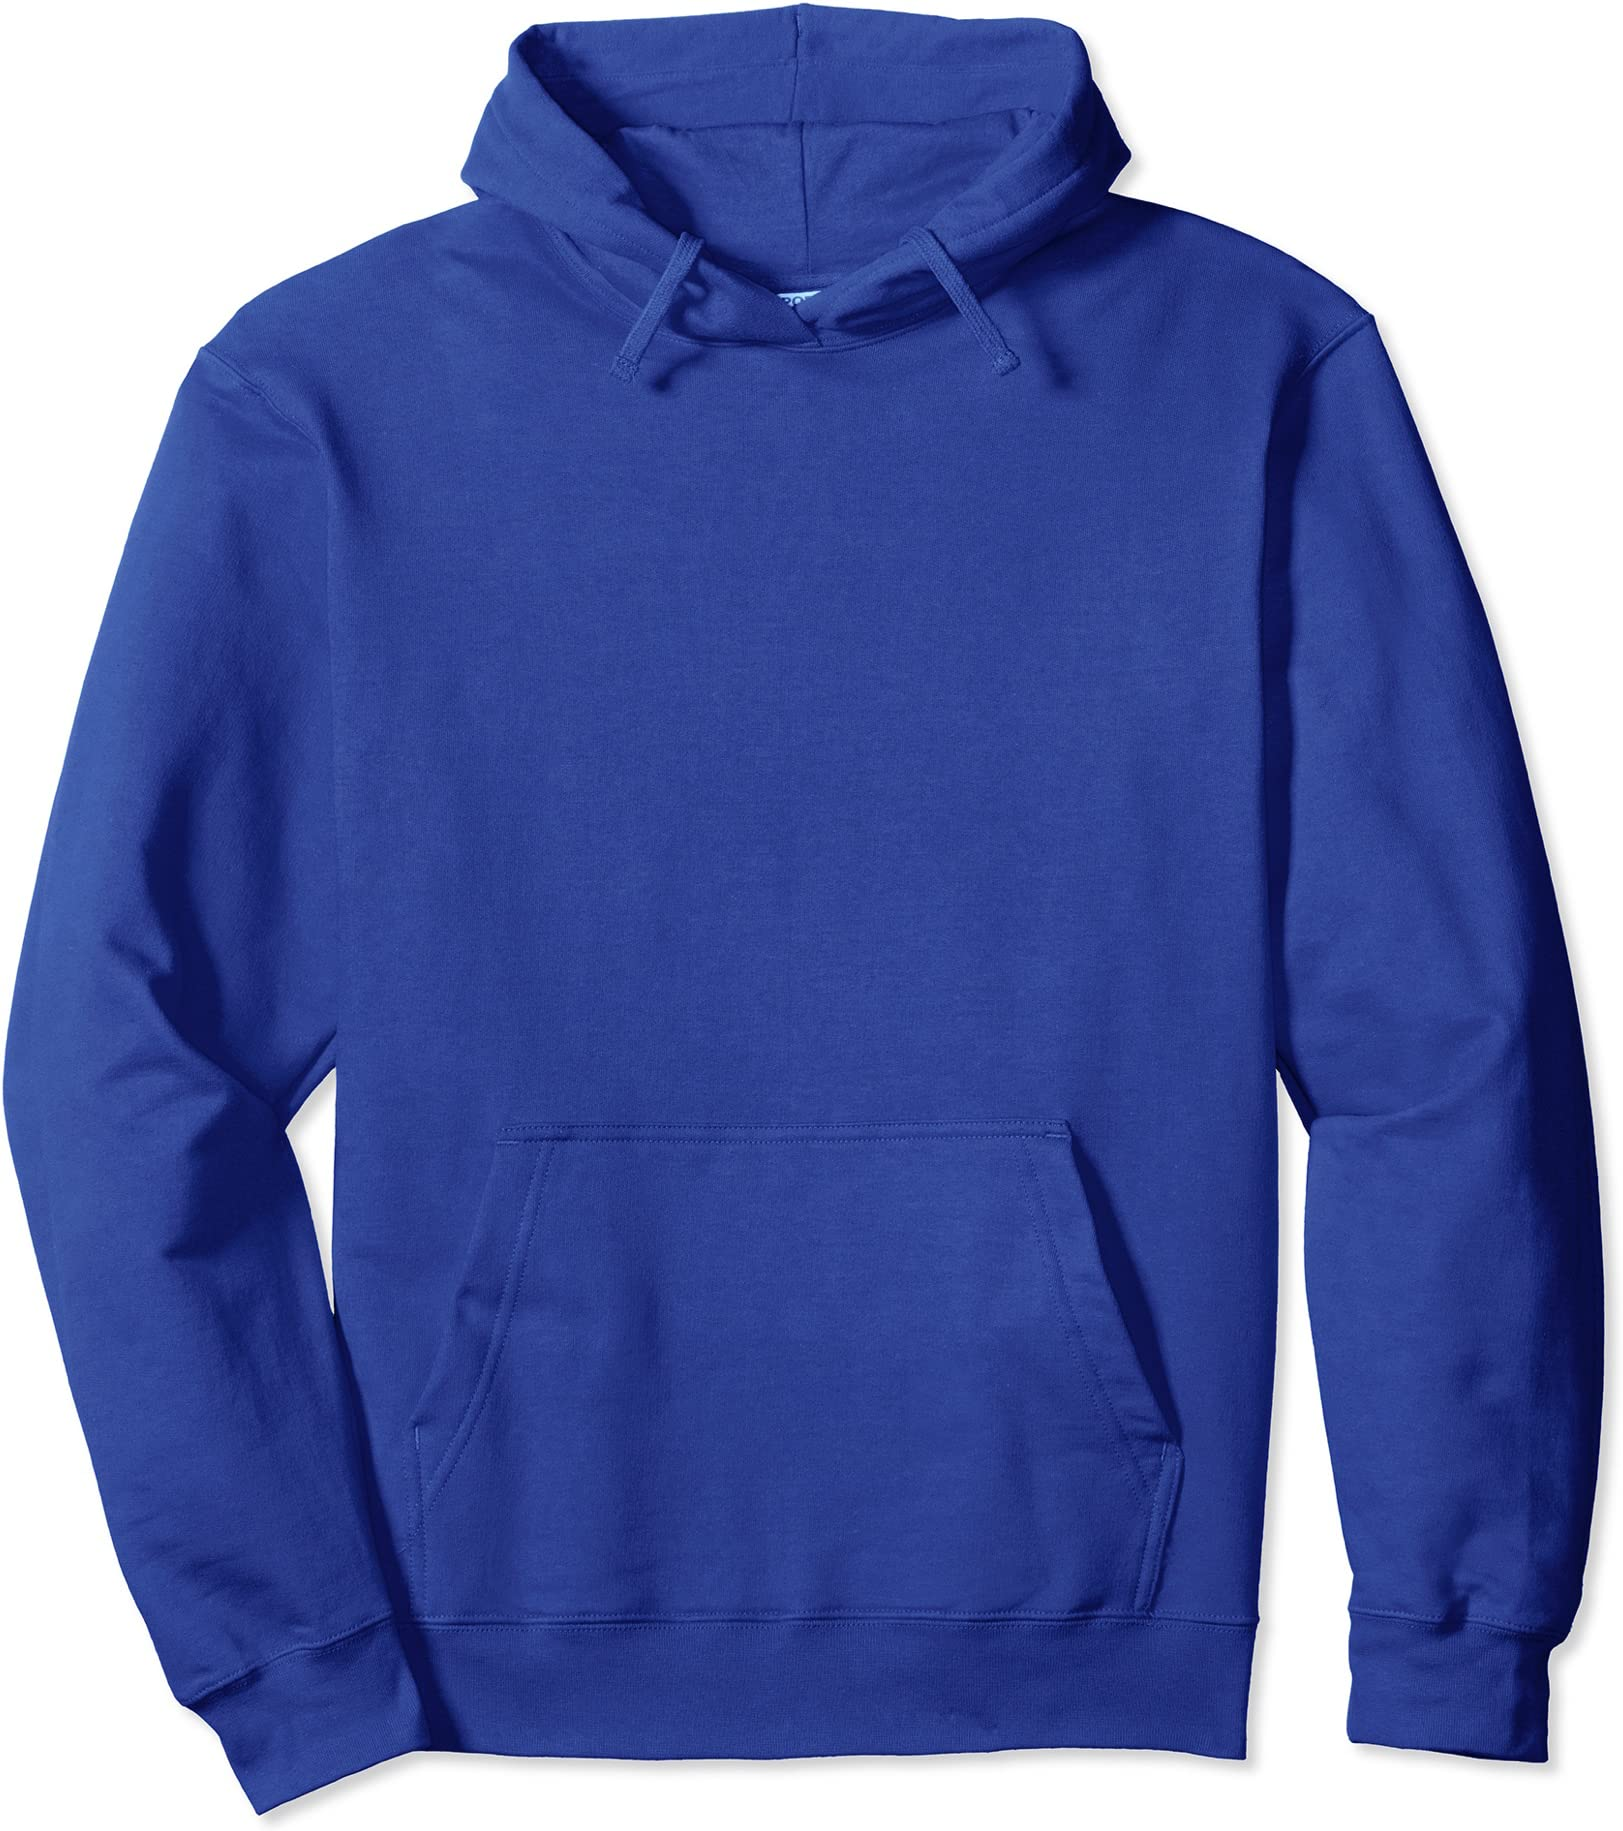 Dive Dive Dive Youth and Mens Sweatshirt